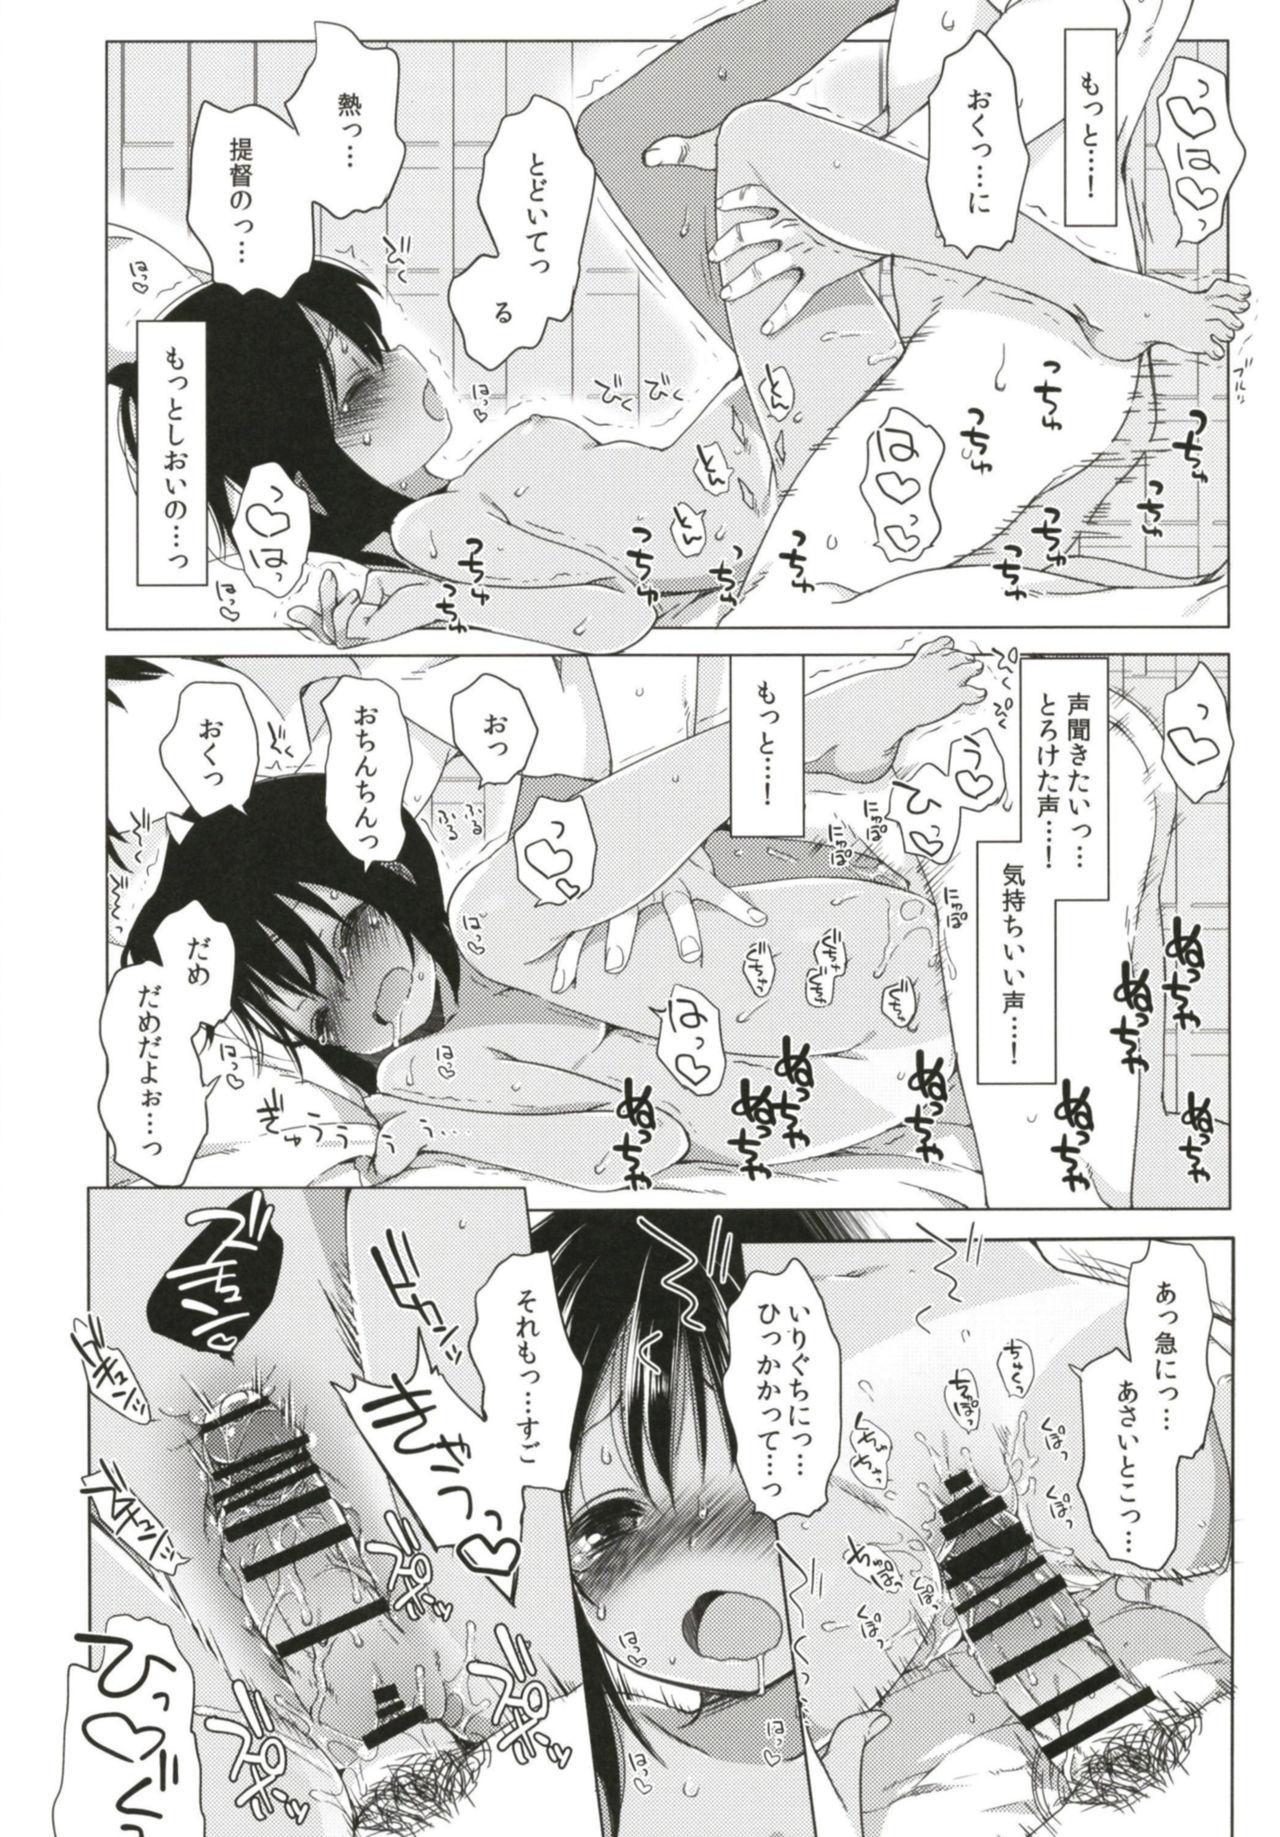 [French letter (Fujisaki Hikari)] Hitonatsu no Ayamachi -I-401 Soushuuhen- (Kantai Collection -KanColle-) [Digital] 17